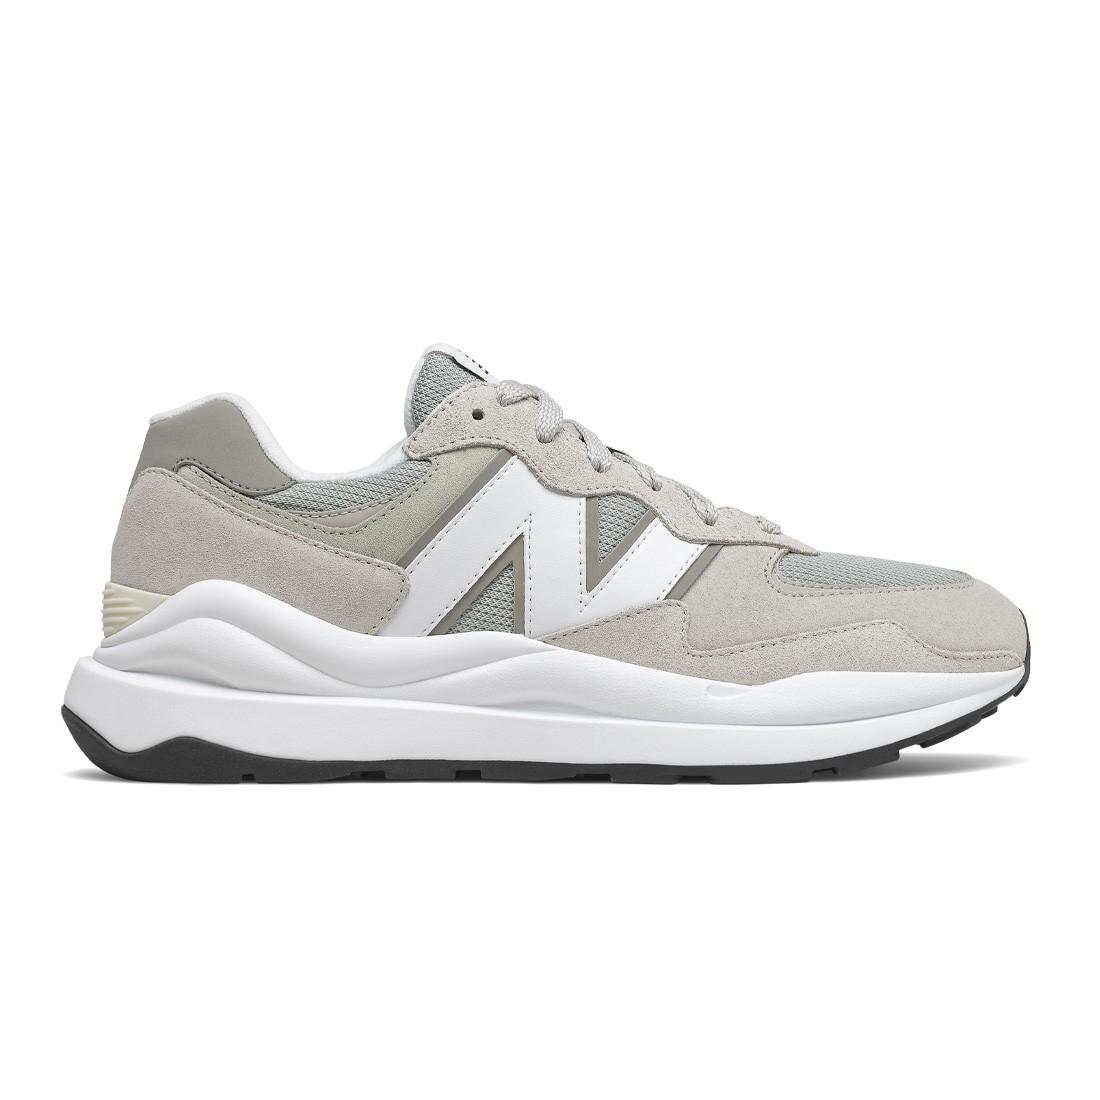 New Balance Men 57/40 M5740CA (gray / rain cloud / white)